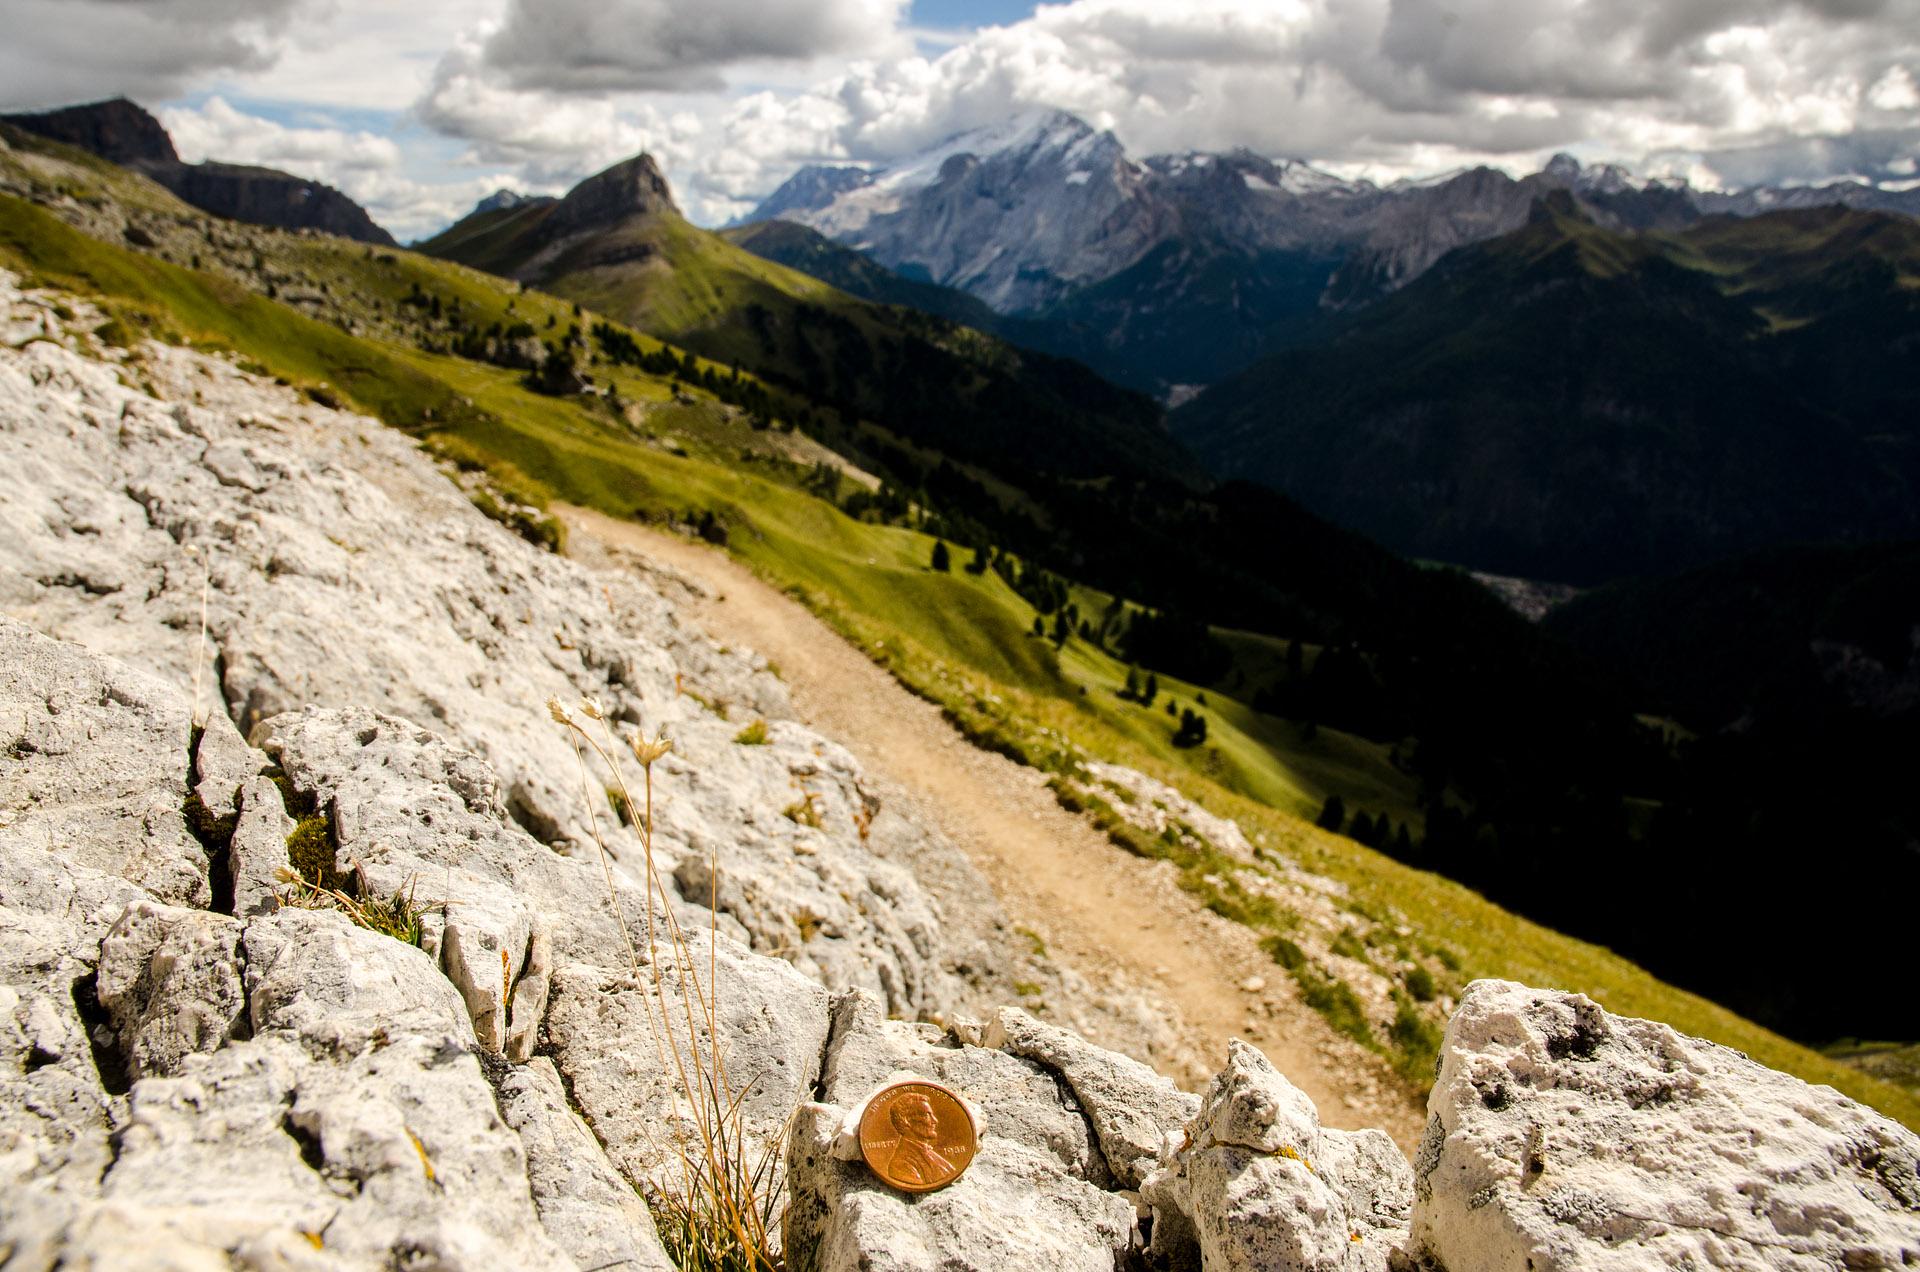 Alpe di Siusi (Dolomites)